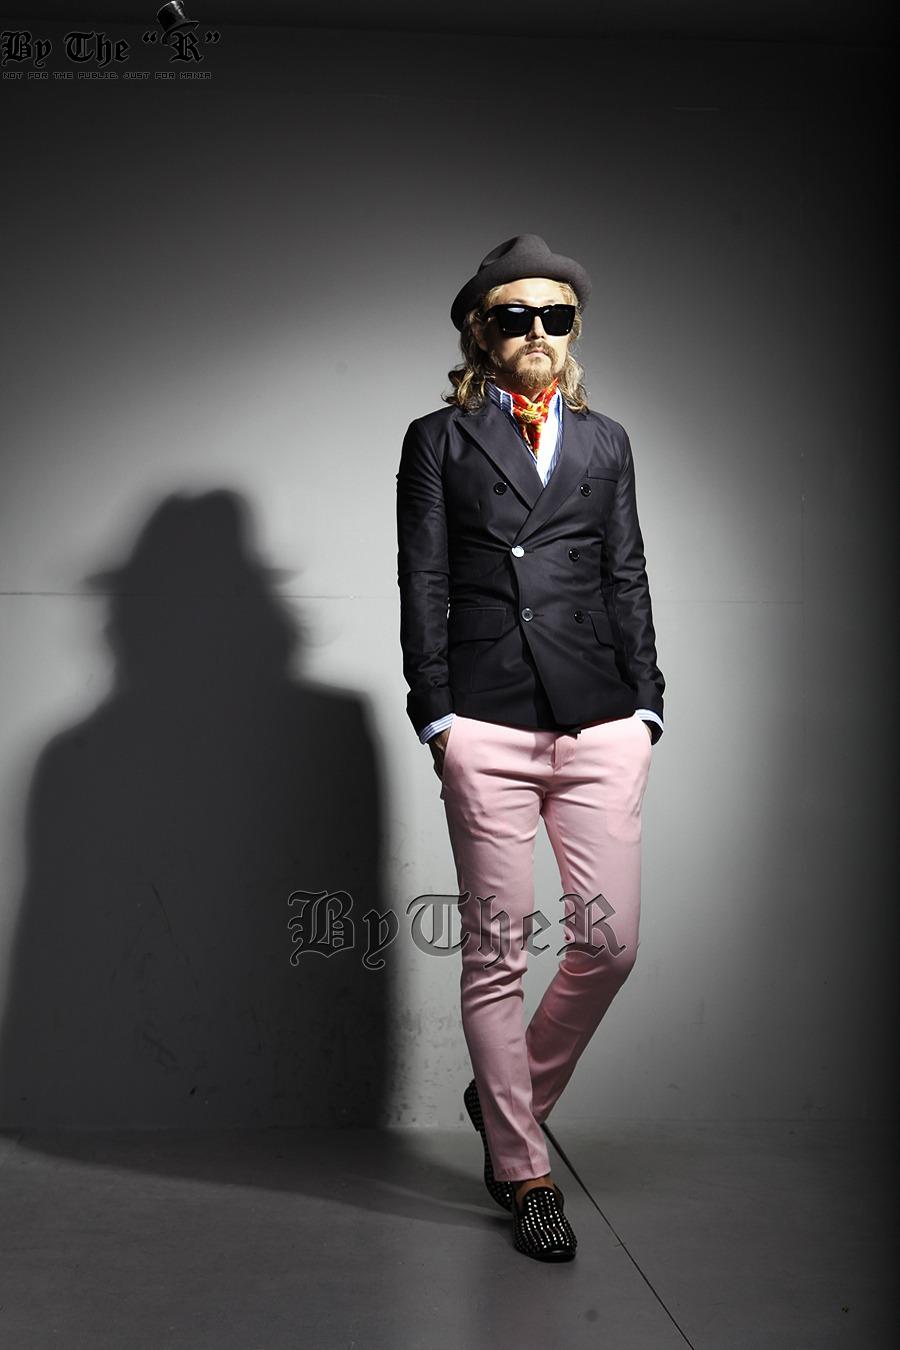 wl工厂韩国代购时尚男装男鞋低帮铆钉潮范儿br个性单